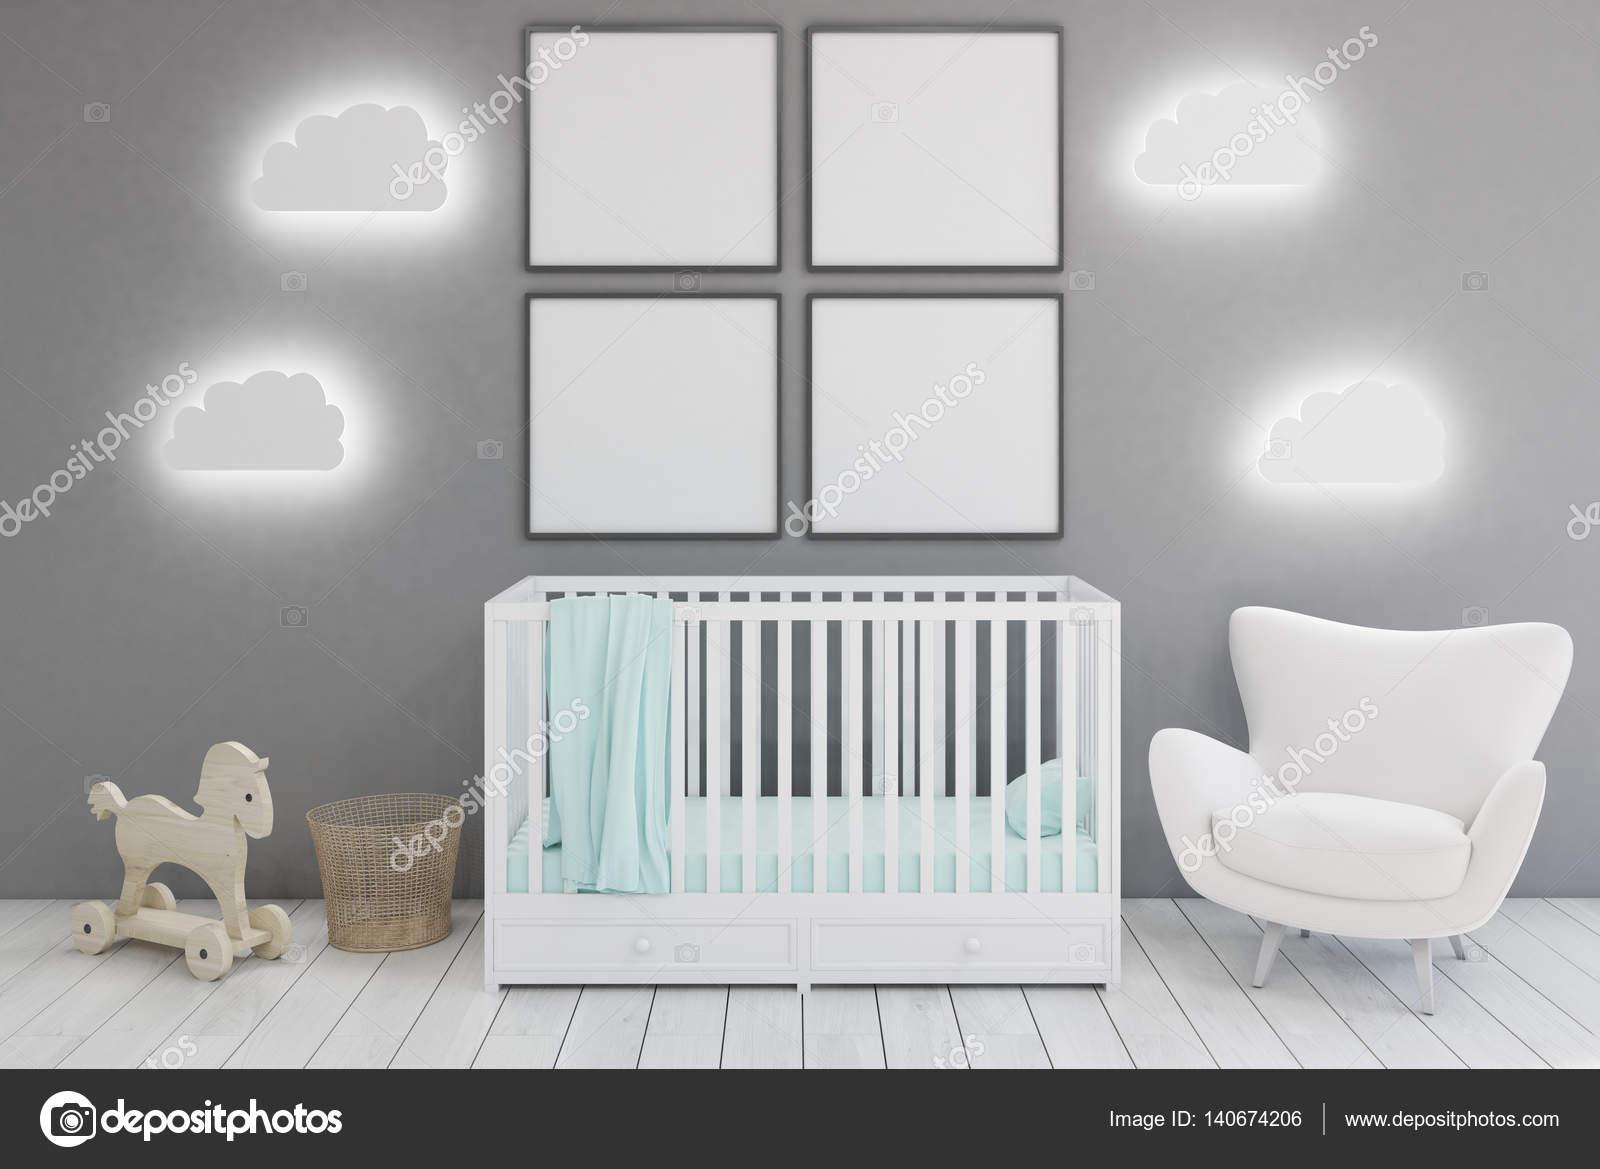 66c4462c702 Παιδικό δωμάτιο με πολυθρόνα και αφίσες — Φωτογραφία Αρχείου ...